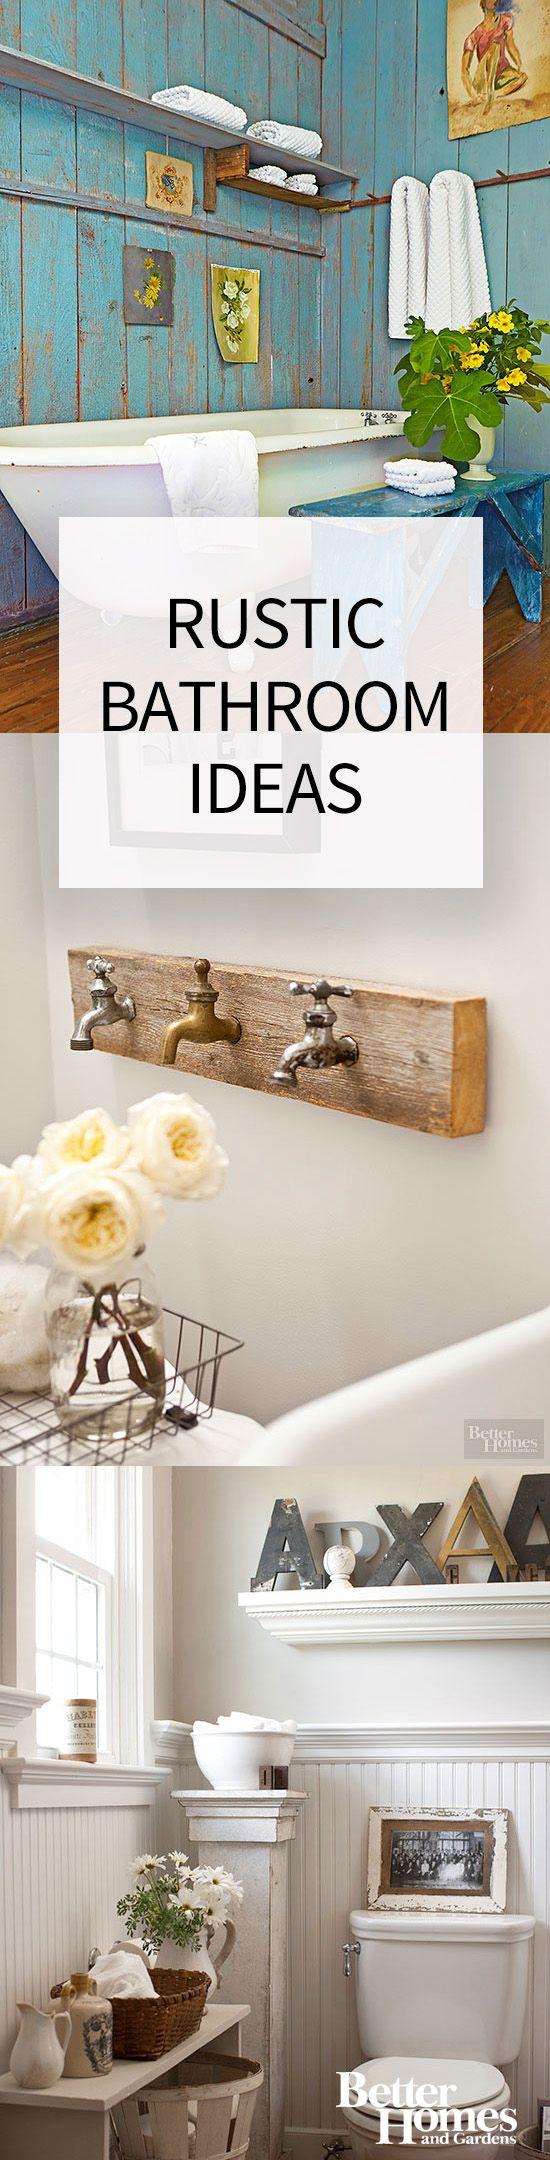 Best  Rustic Bathroom Designs Ideas On Pinterest - Bathroom ideas rustic